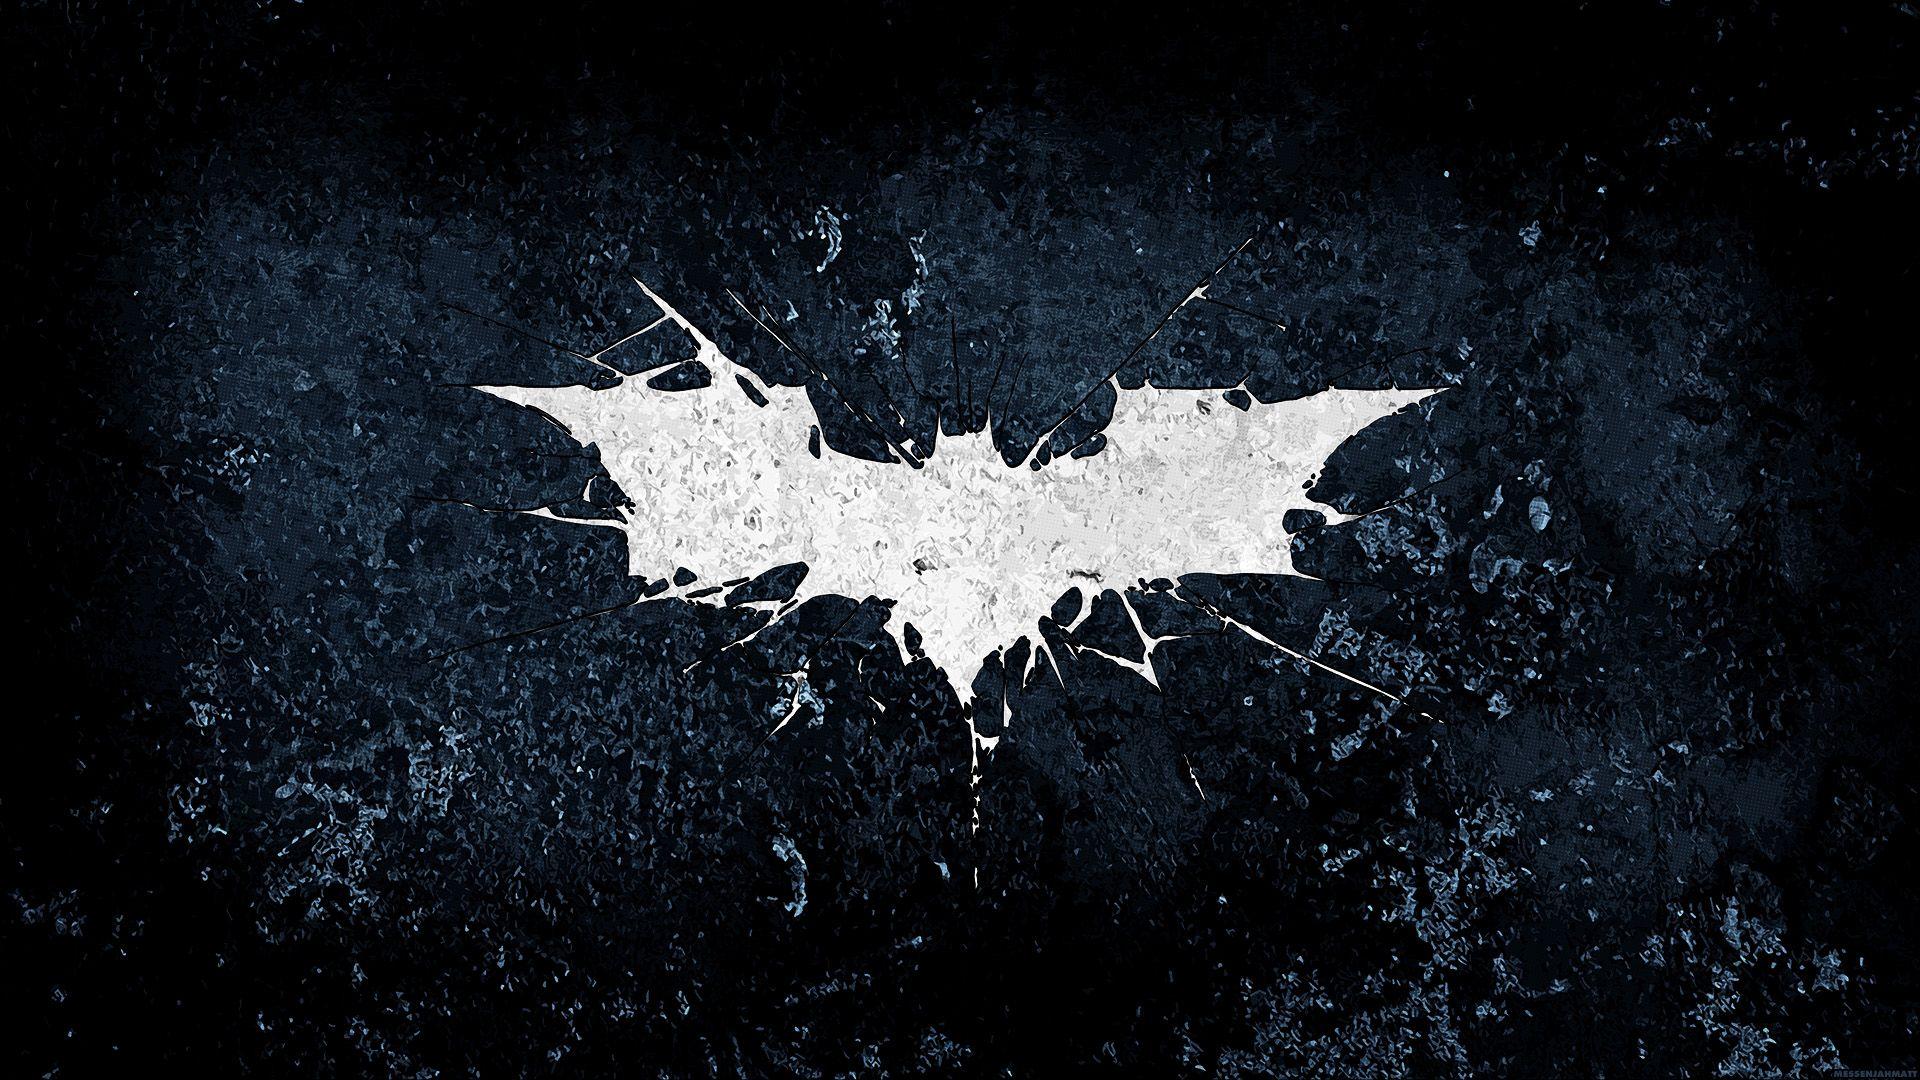 Download HD Dark Knight Rises Wallpaper For Computer HD ... The Dark Knight Rises Iphone Wallpaper